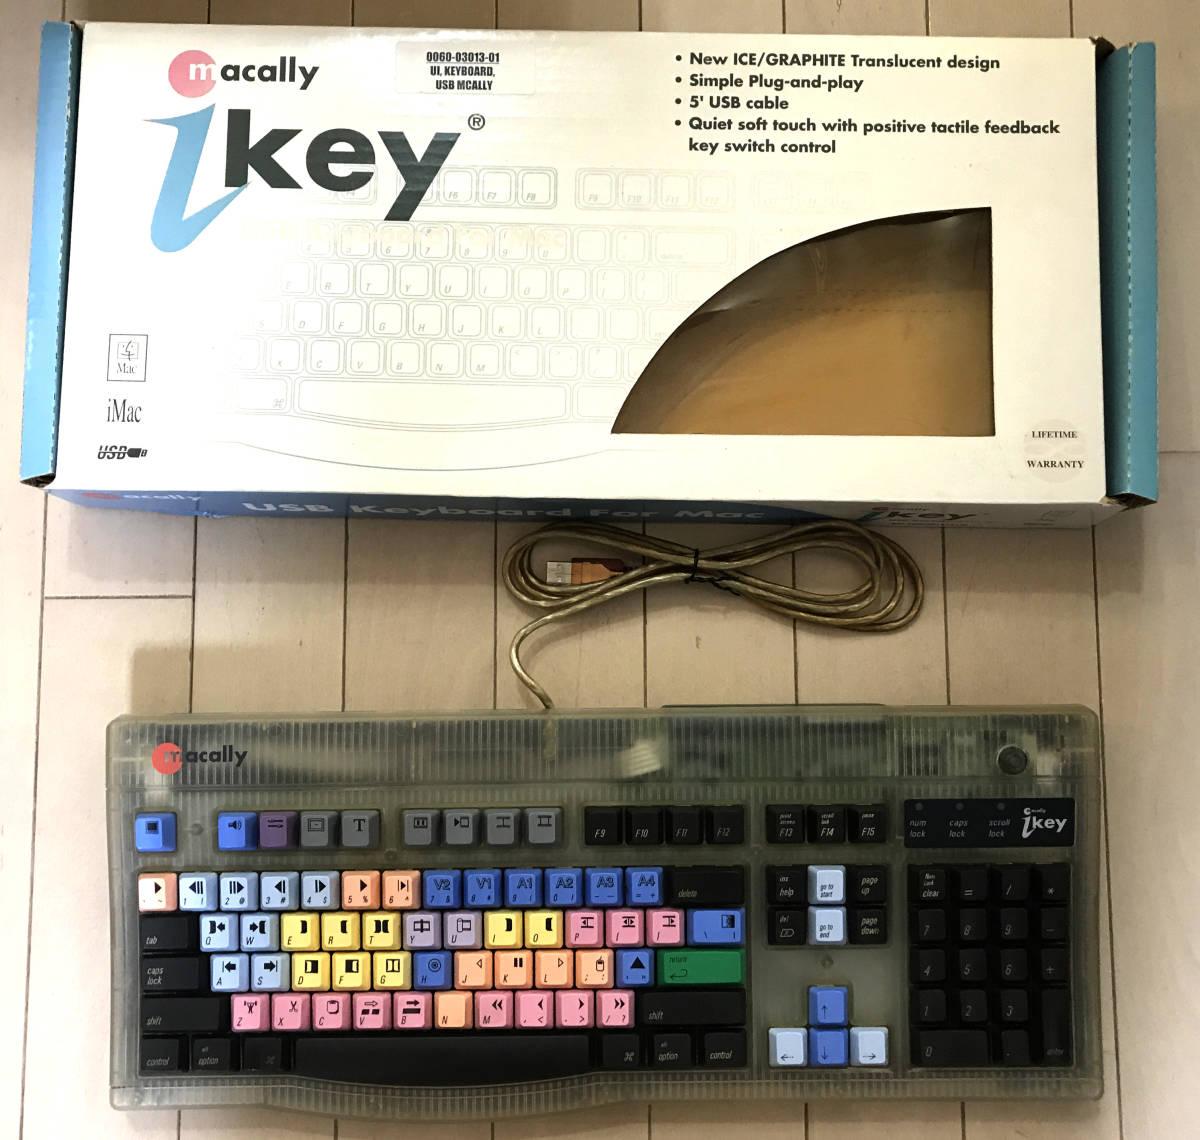 Avid Media Composer USBキーボード Mac用 正規販売店から購入したワンオーナー品 元箱あり 中古 完動品 USA仕様 放送 業務 編集_画像5